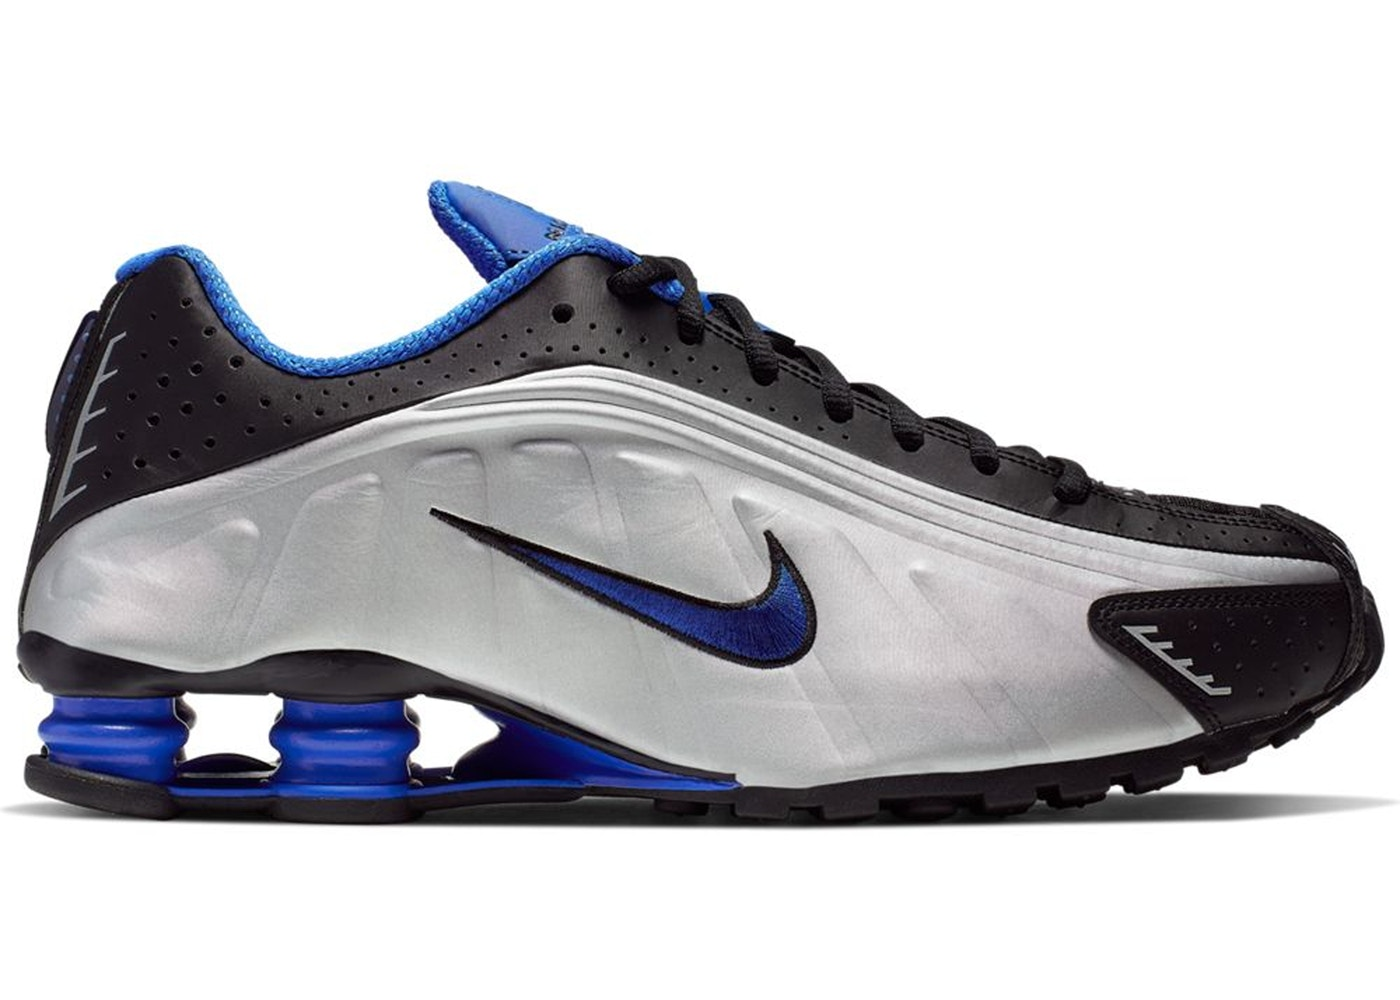 Nike Shox R4 Racer Blue